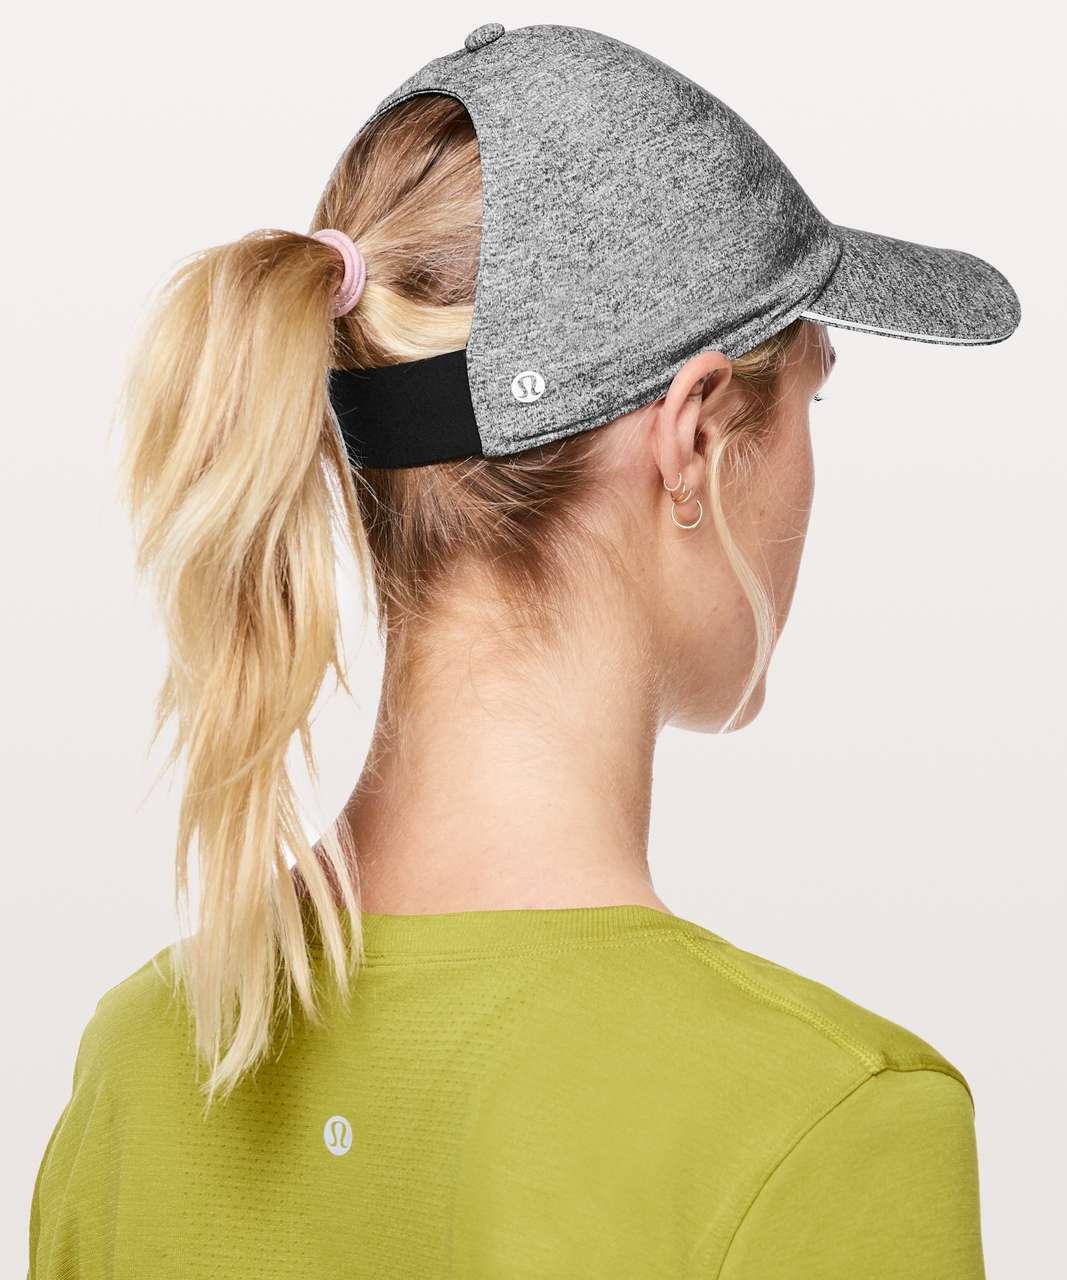 35f4d823 Lululemon Baller Hat Run *Ponytail - Heather Lux Multi Black / Black - lulu  fanatics